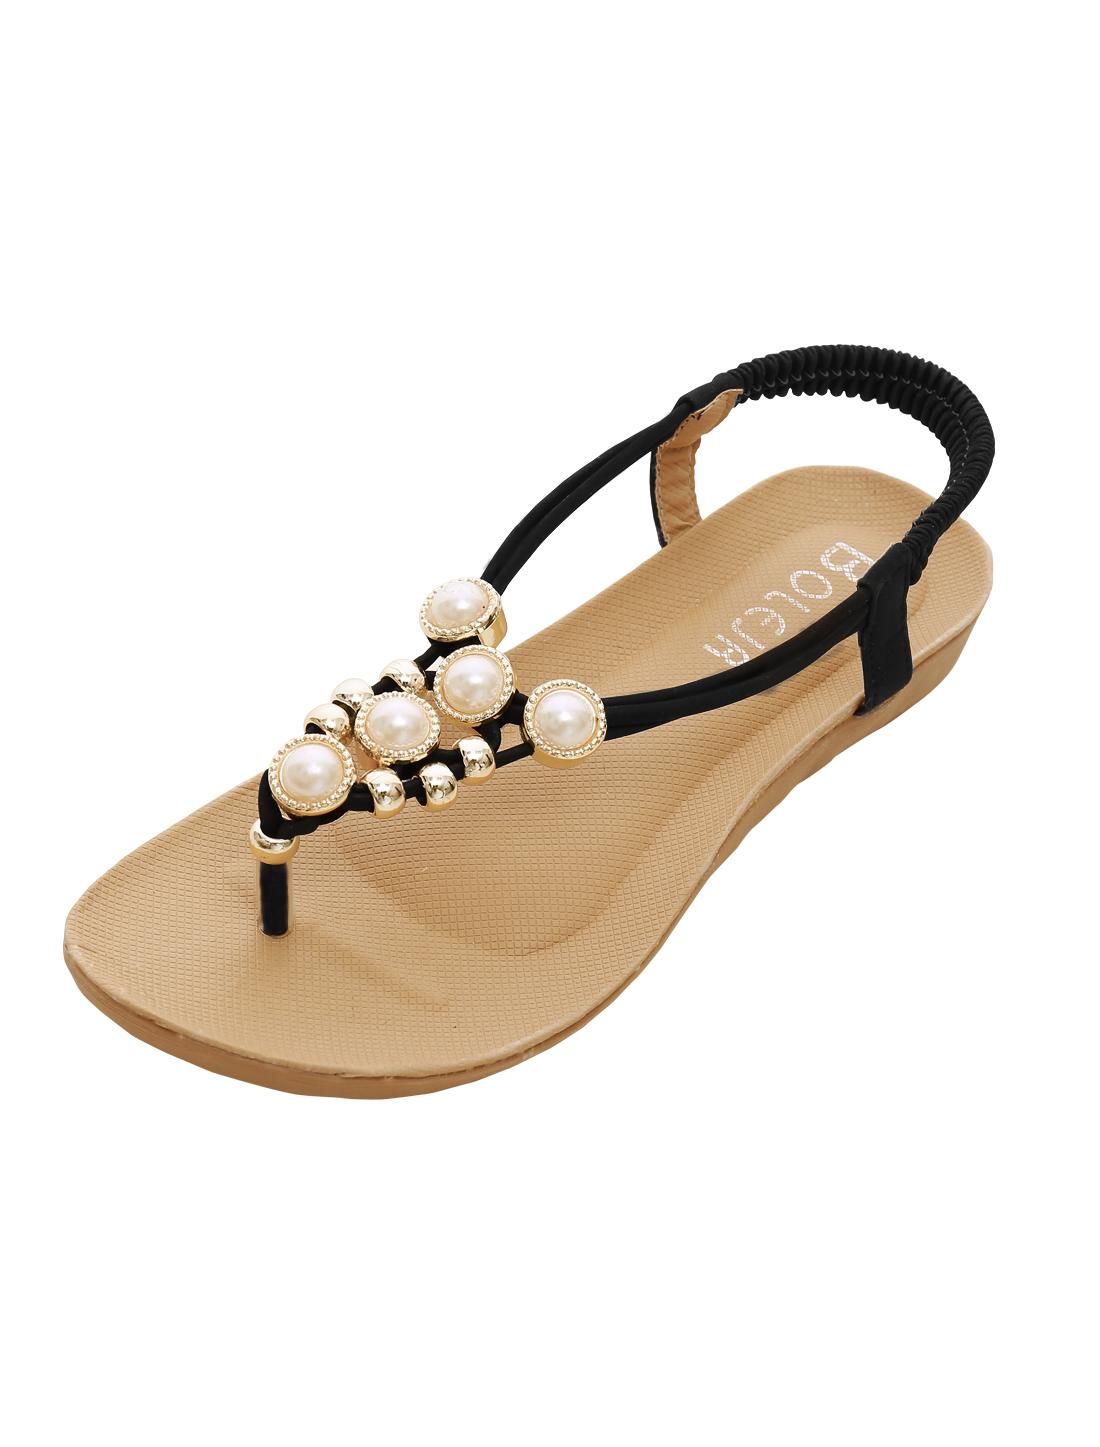 Women Elastic Ankle Strap Toe Post Summer Flat Sandals Black US 5